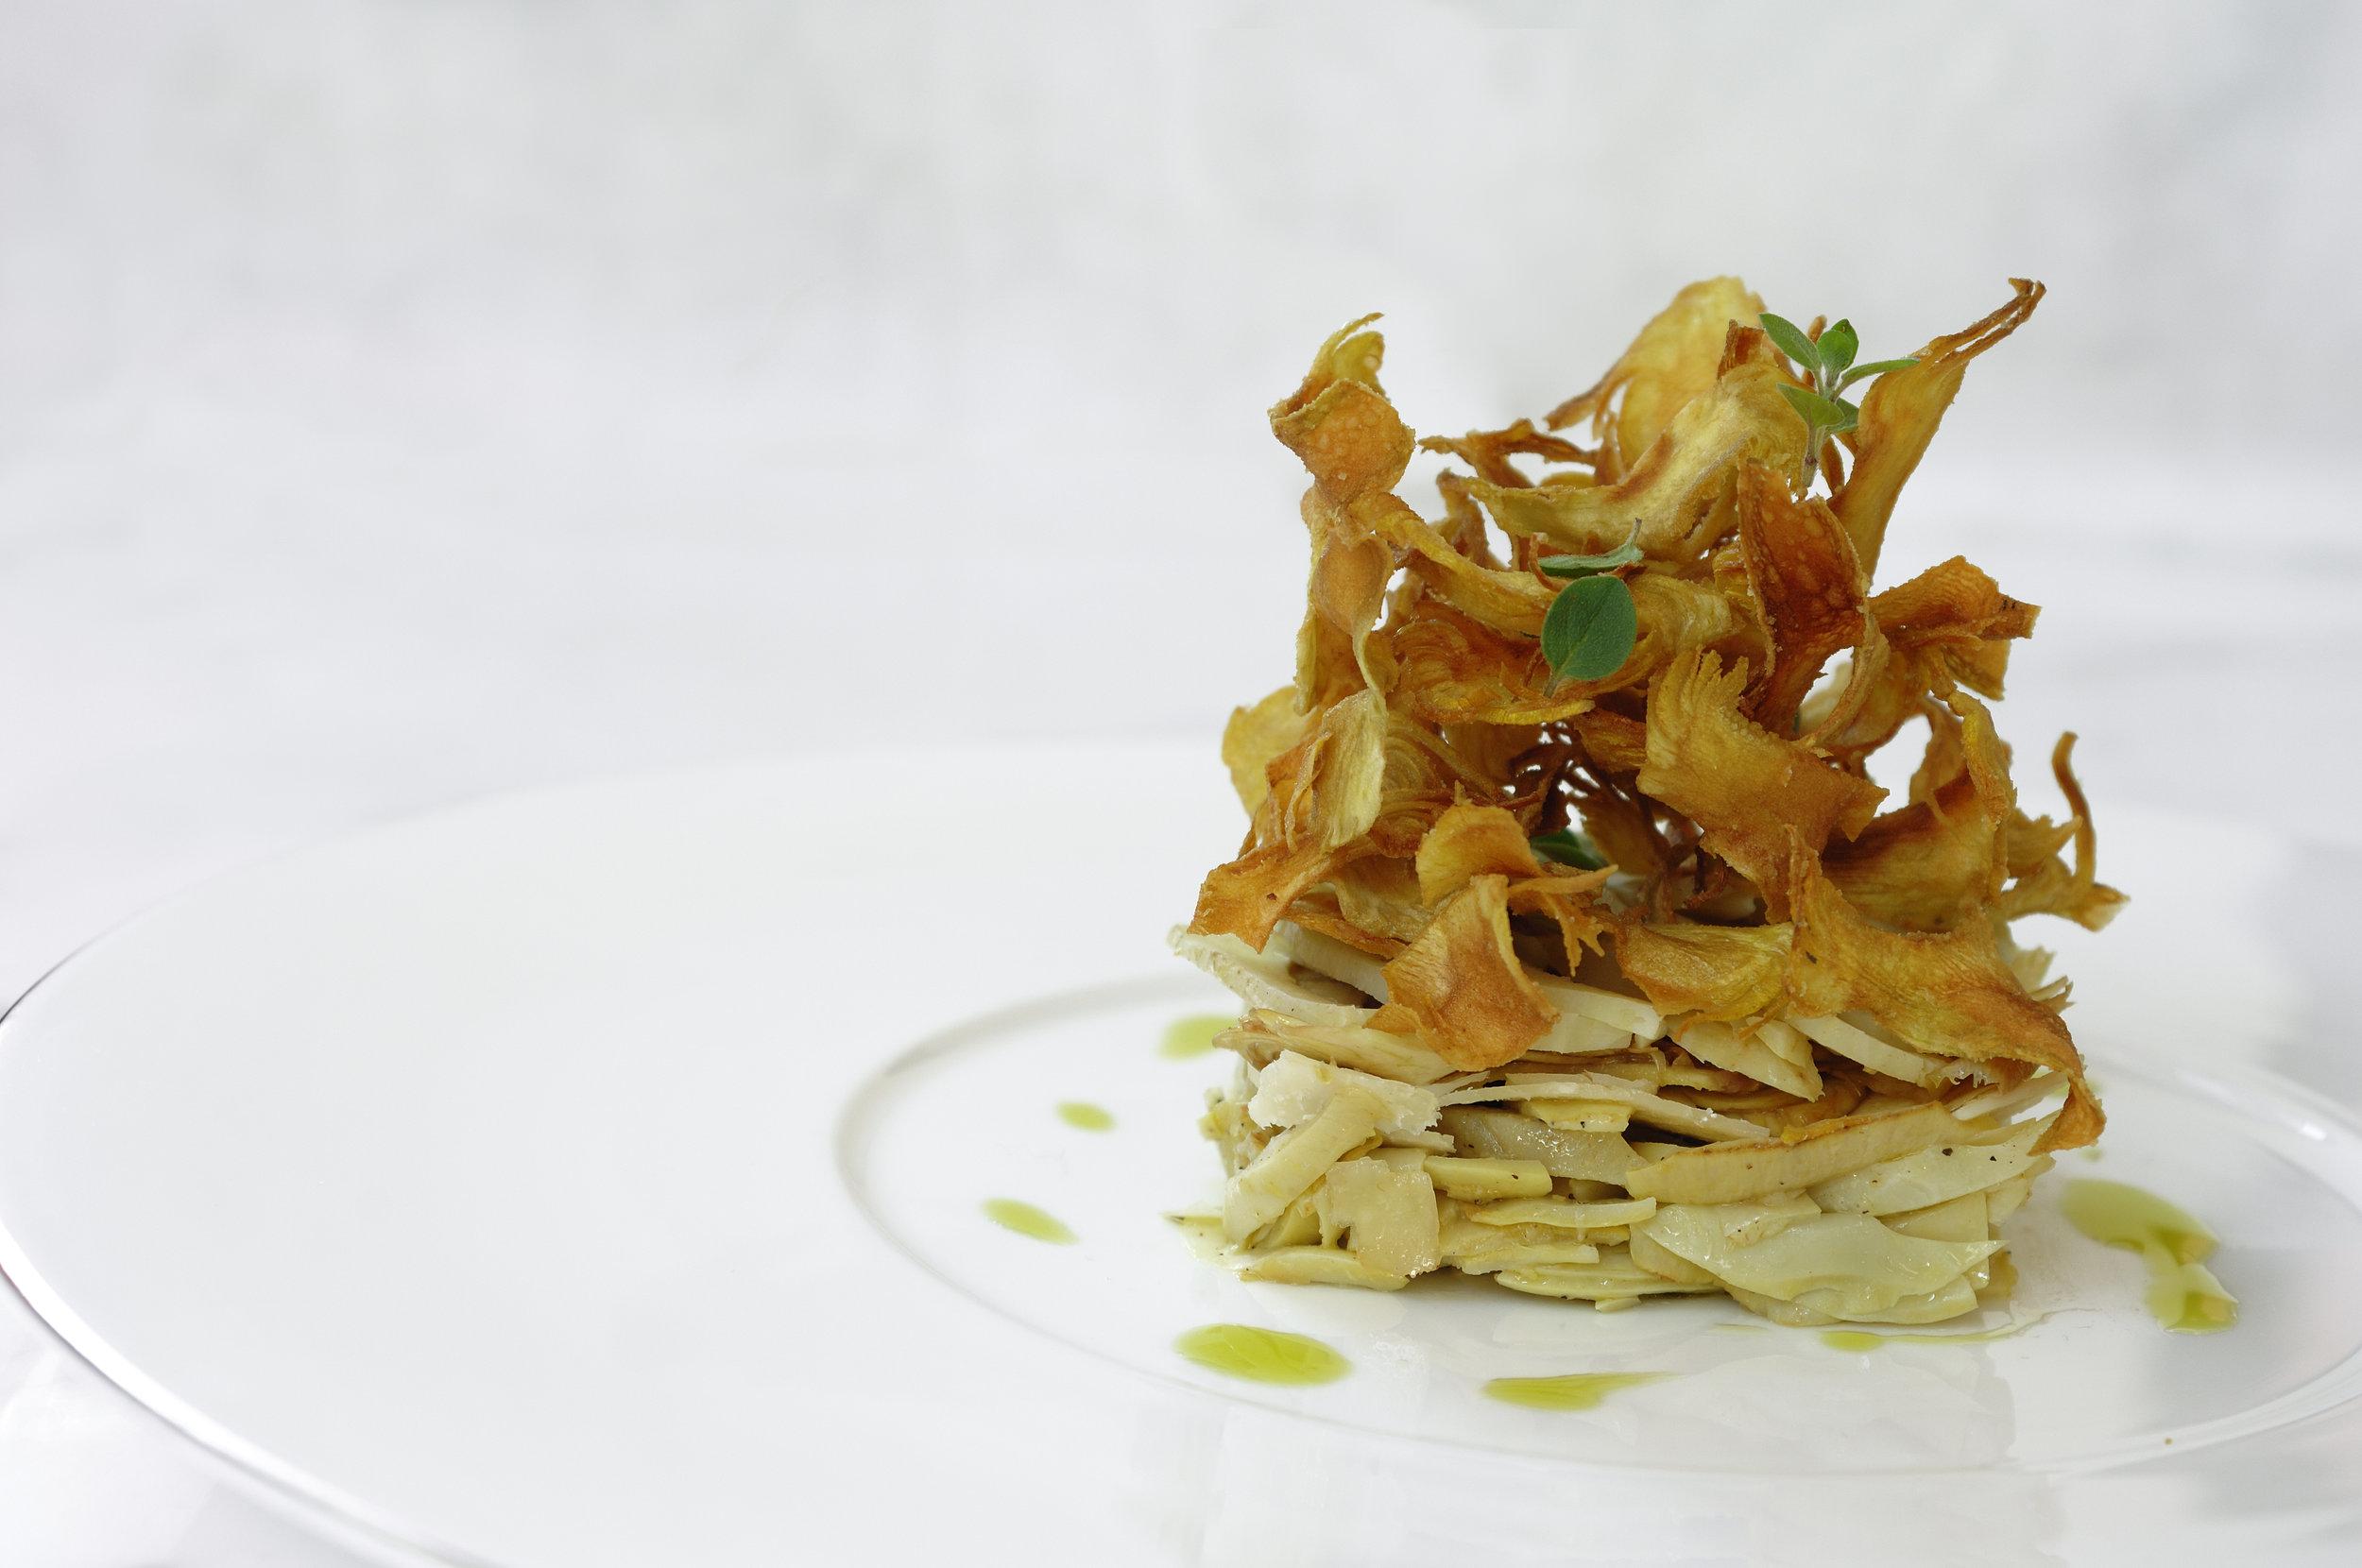 Carpaccio d'artichauts cuits et crus.jpg